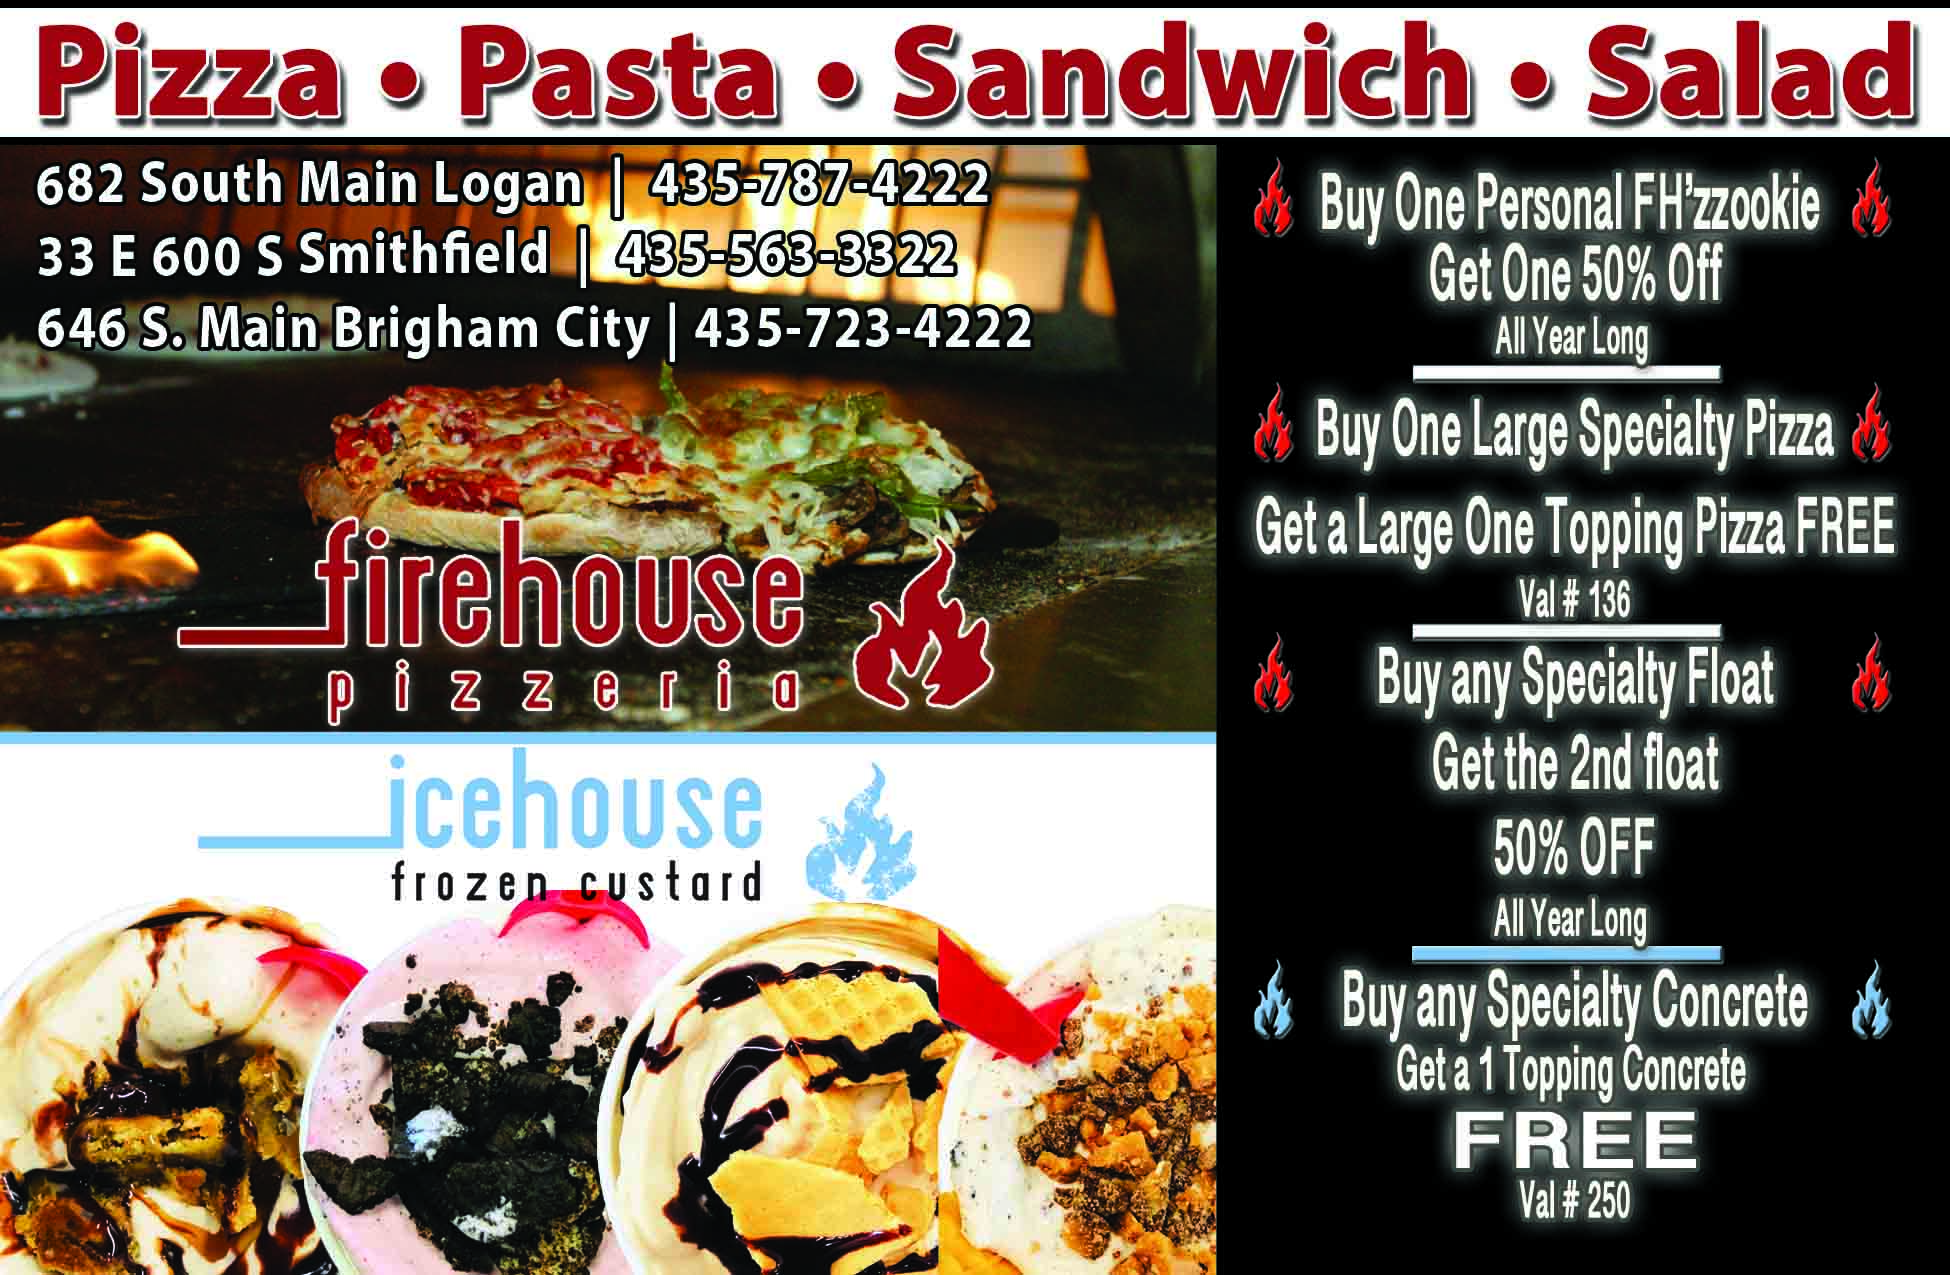 Firehouse Pizzeria Logan Utah Icehouse Frozen Custard